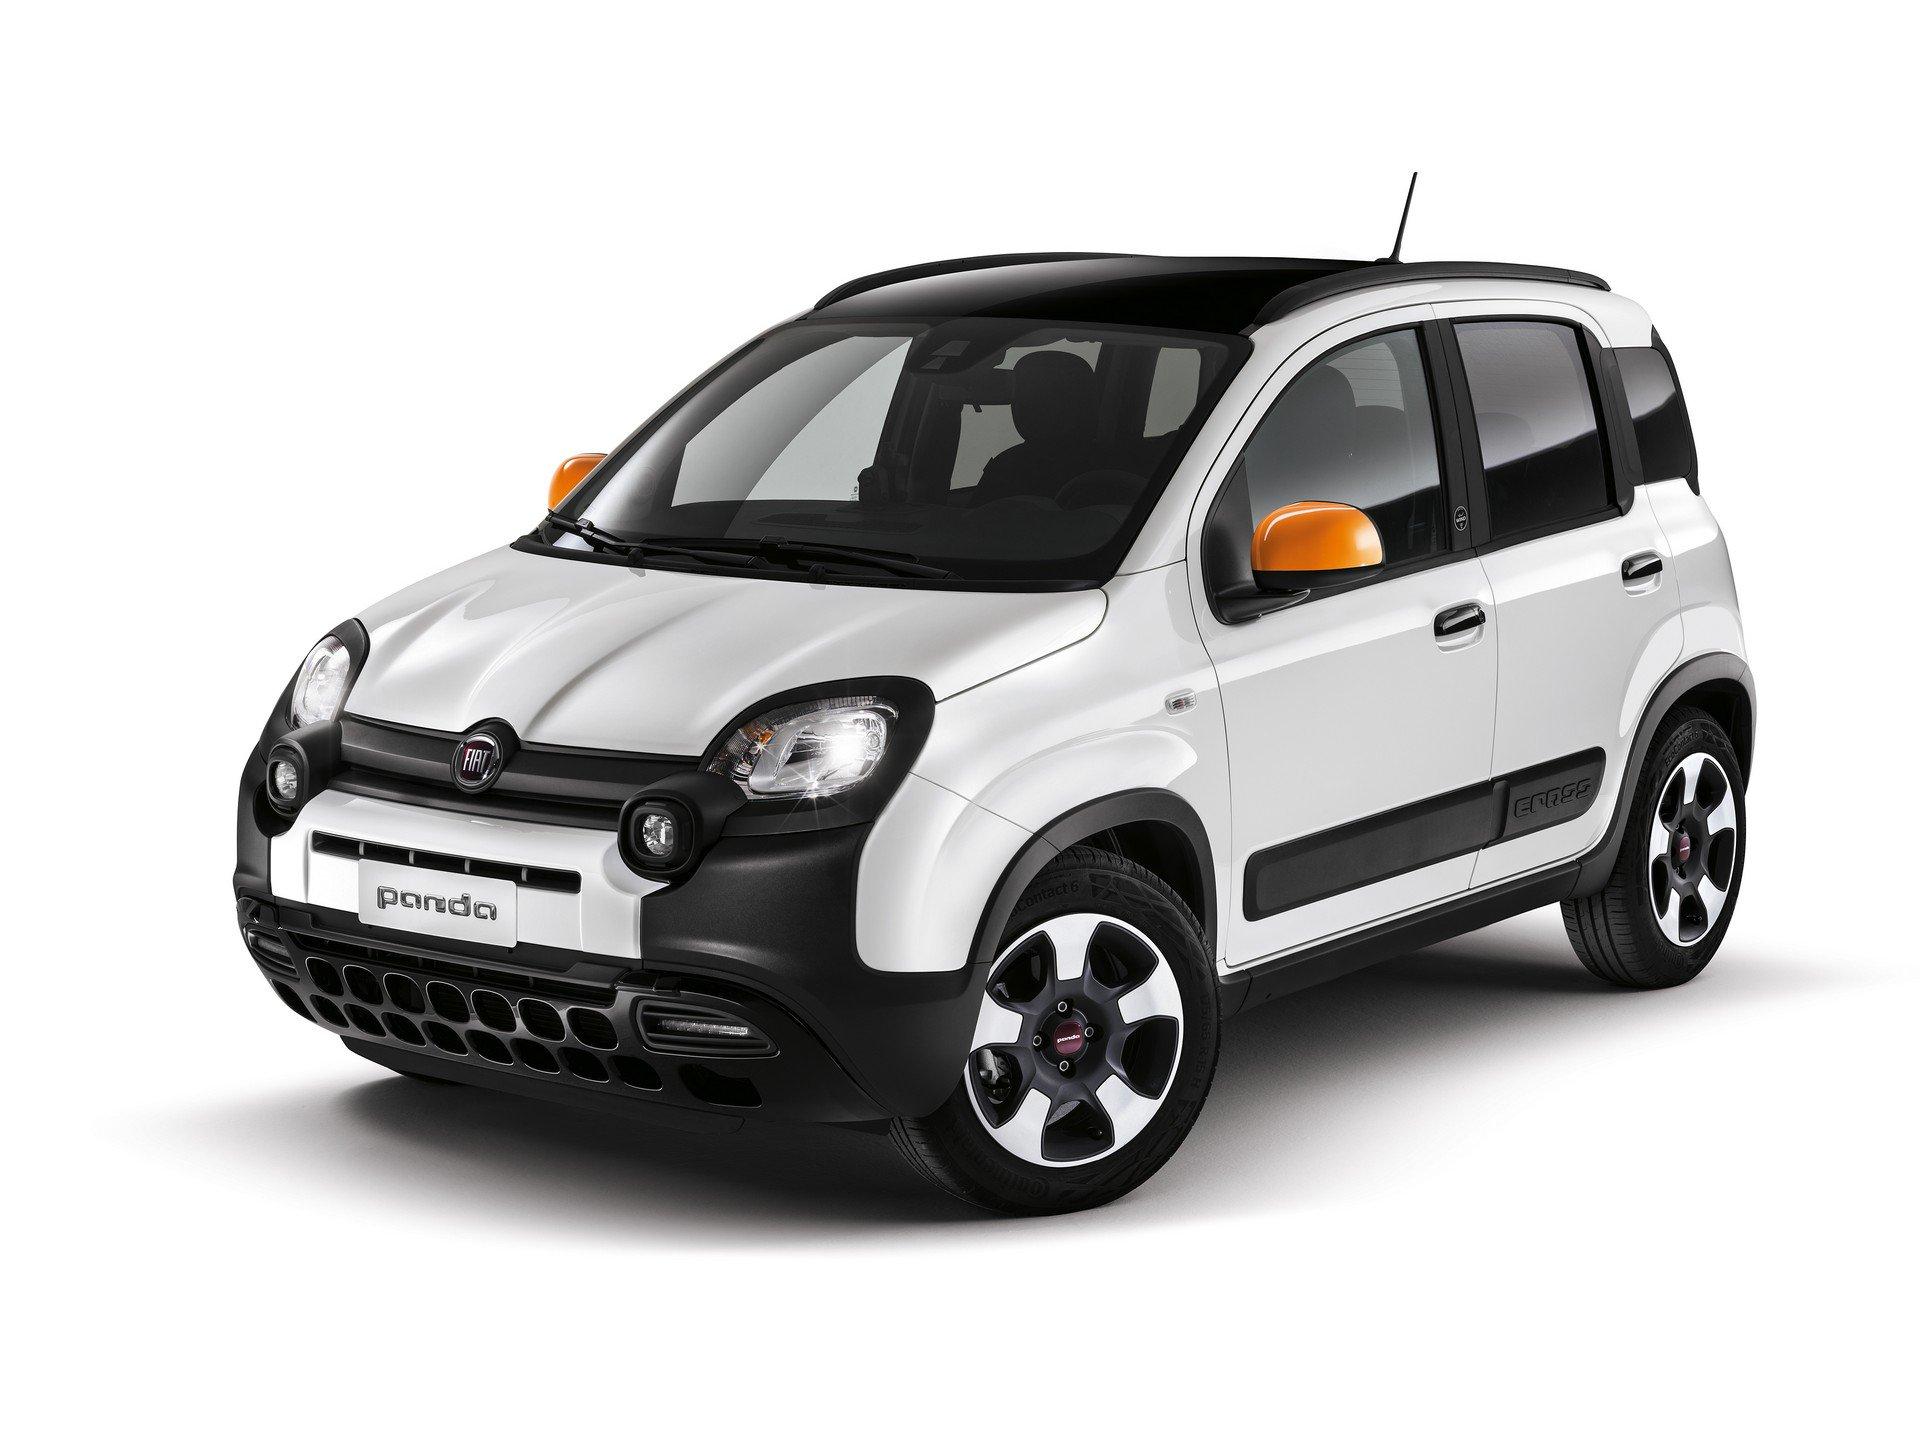 2019 Fiat Panda Coneected 12 Arabs Auto